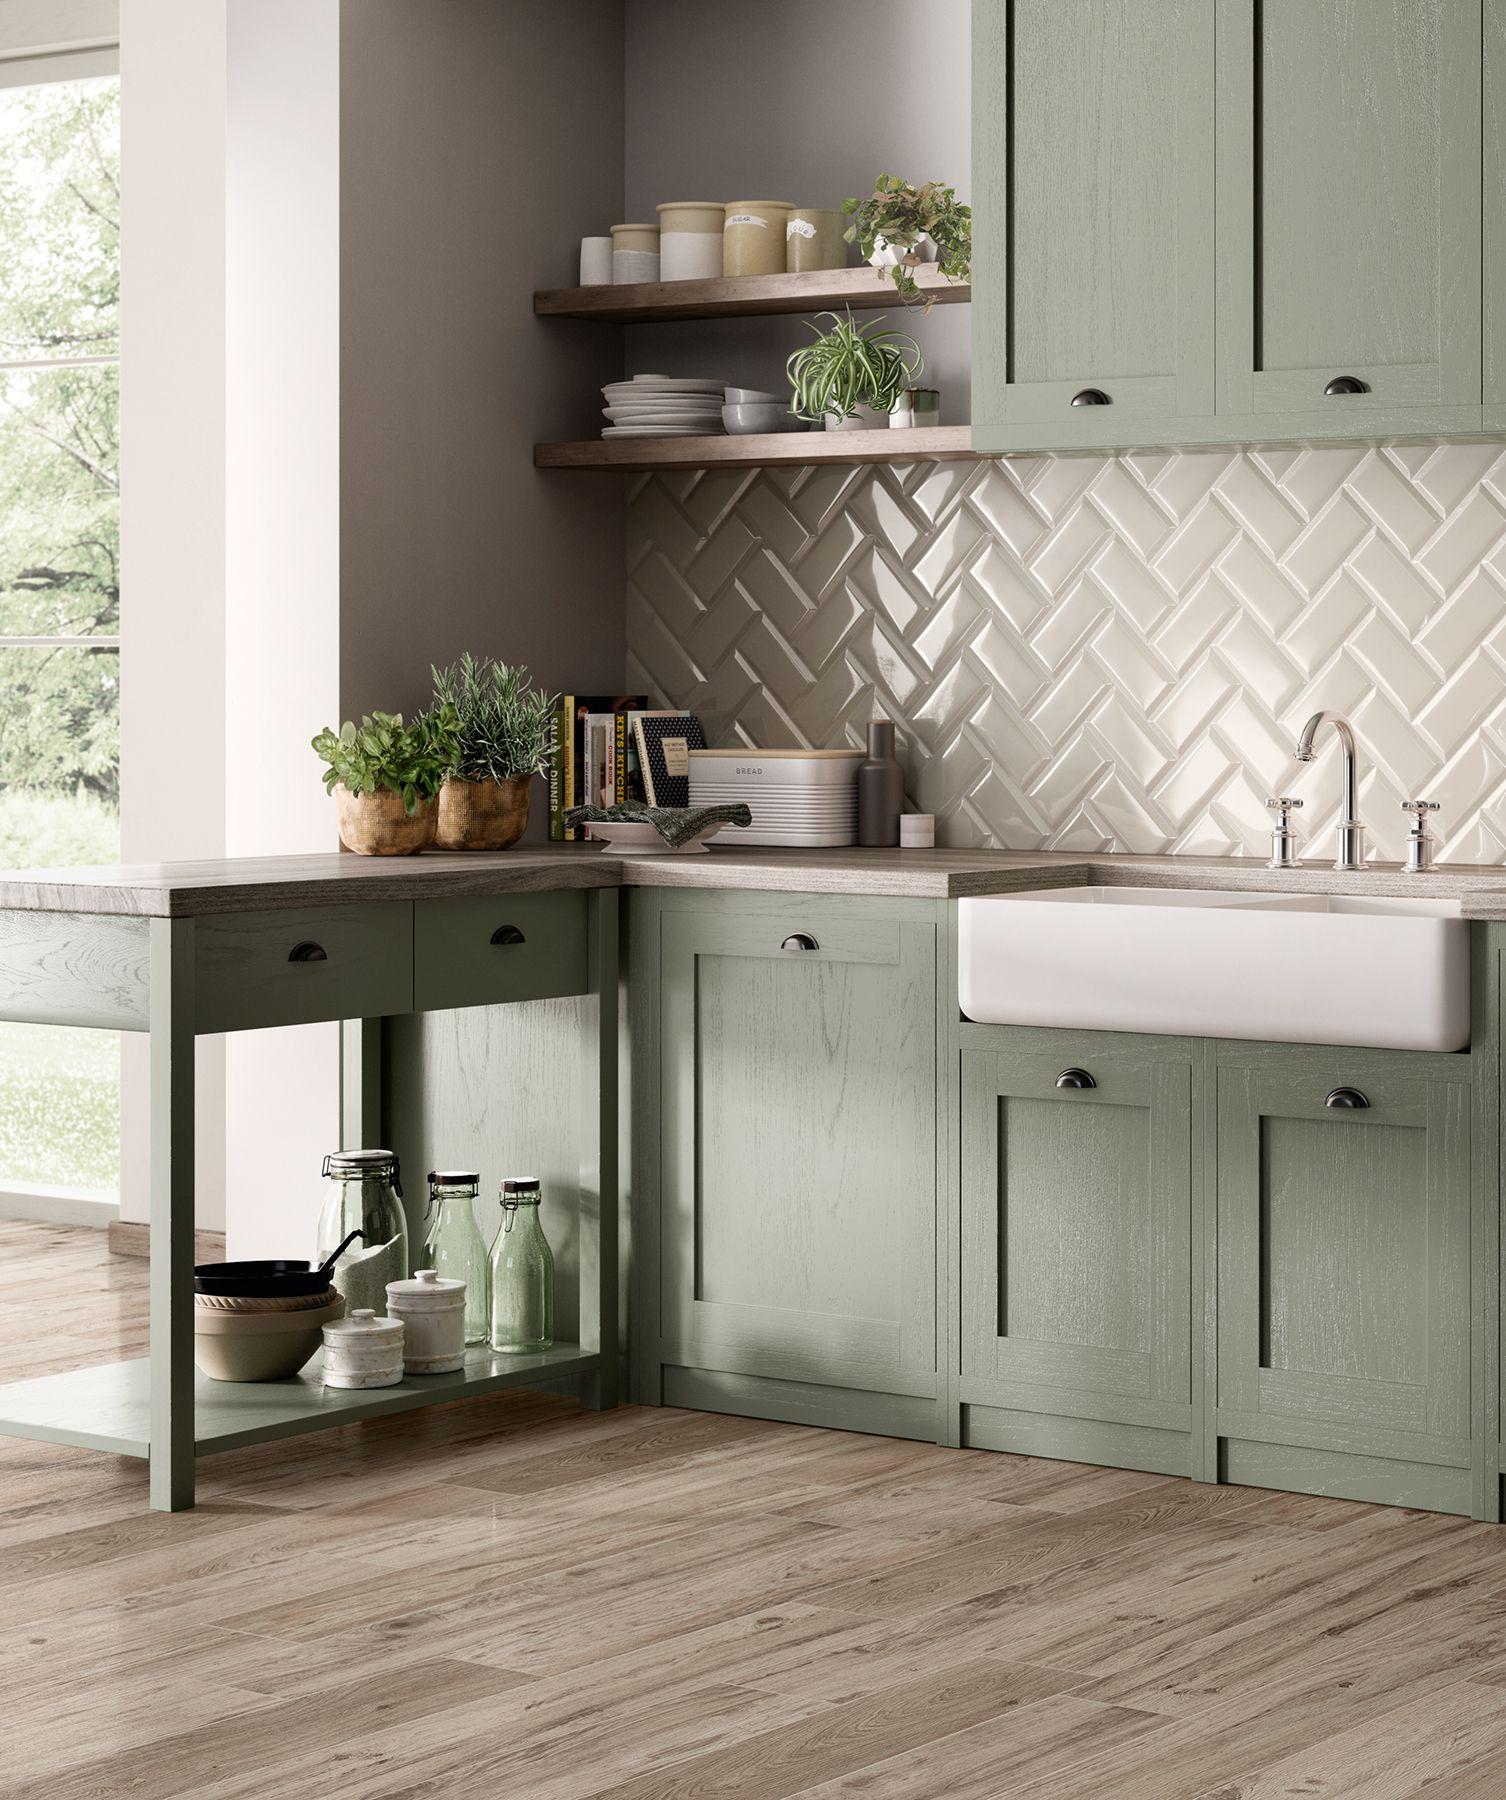 Farm House Chic Sage Green Kitchen With Wood Look Porcelain Floor And Bevelled Subway Tiles Kitchen Decor Inspiration Kitchen Interior Sage Green Kitchen